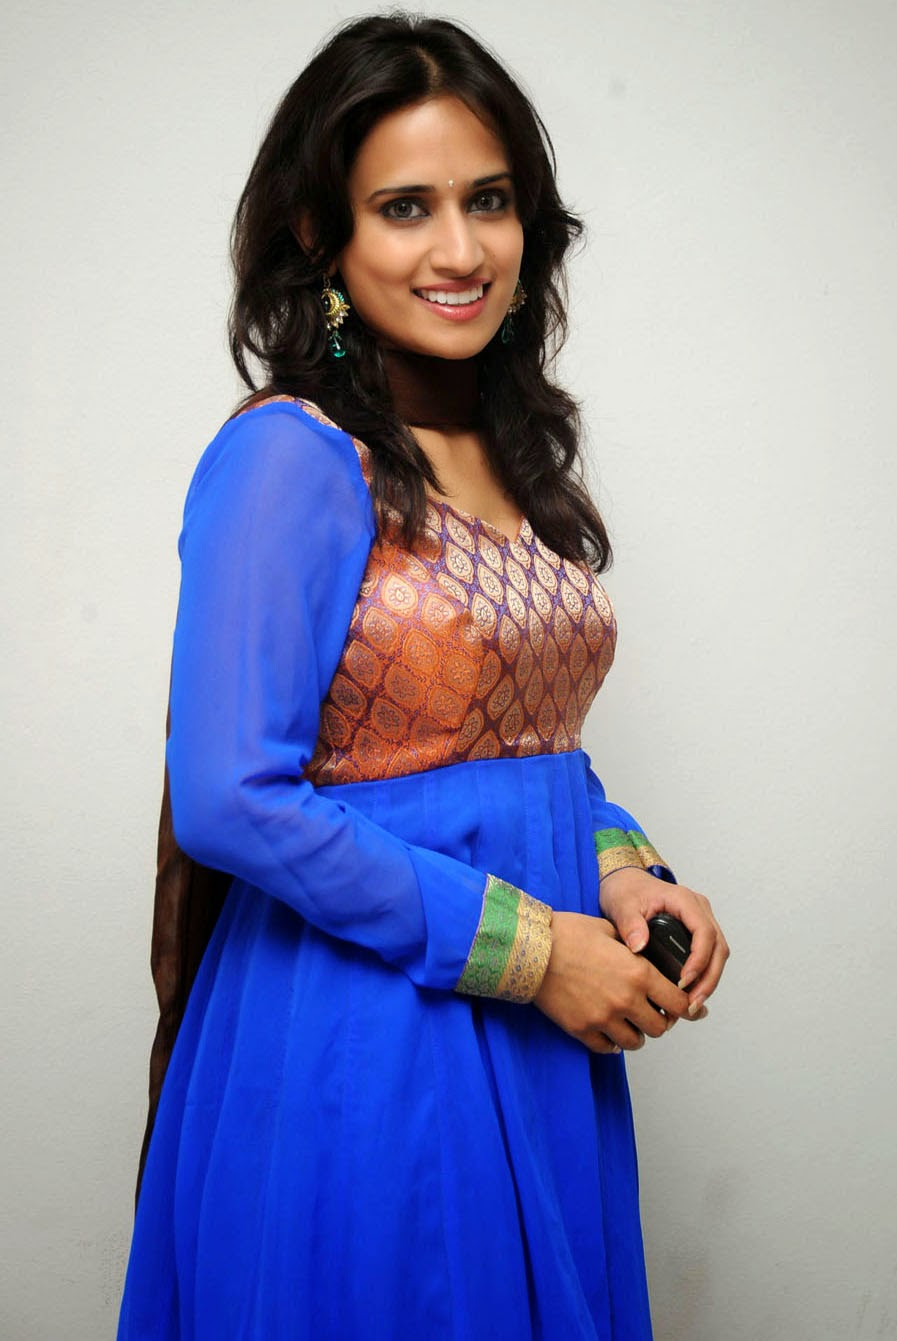 All Indian Beauties: Telugu Actress Chinmayi Ghatrazu